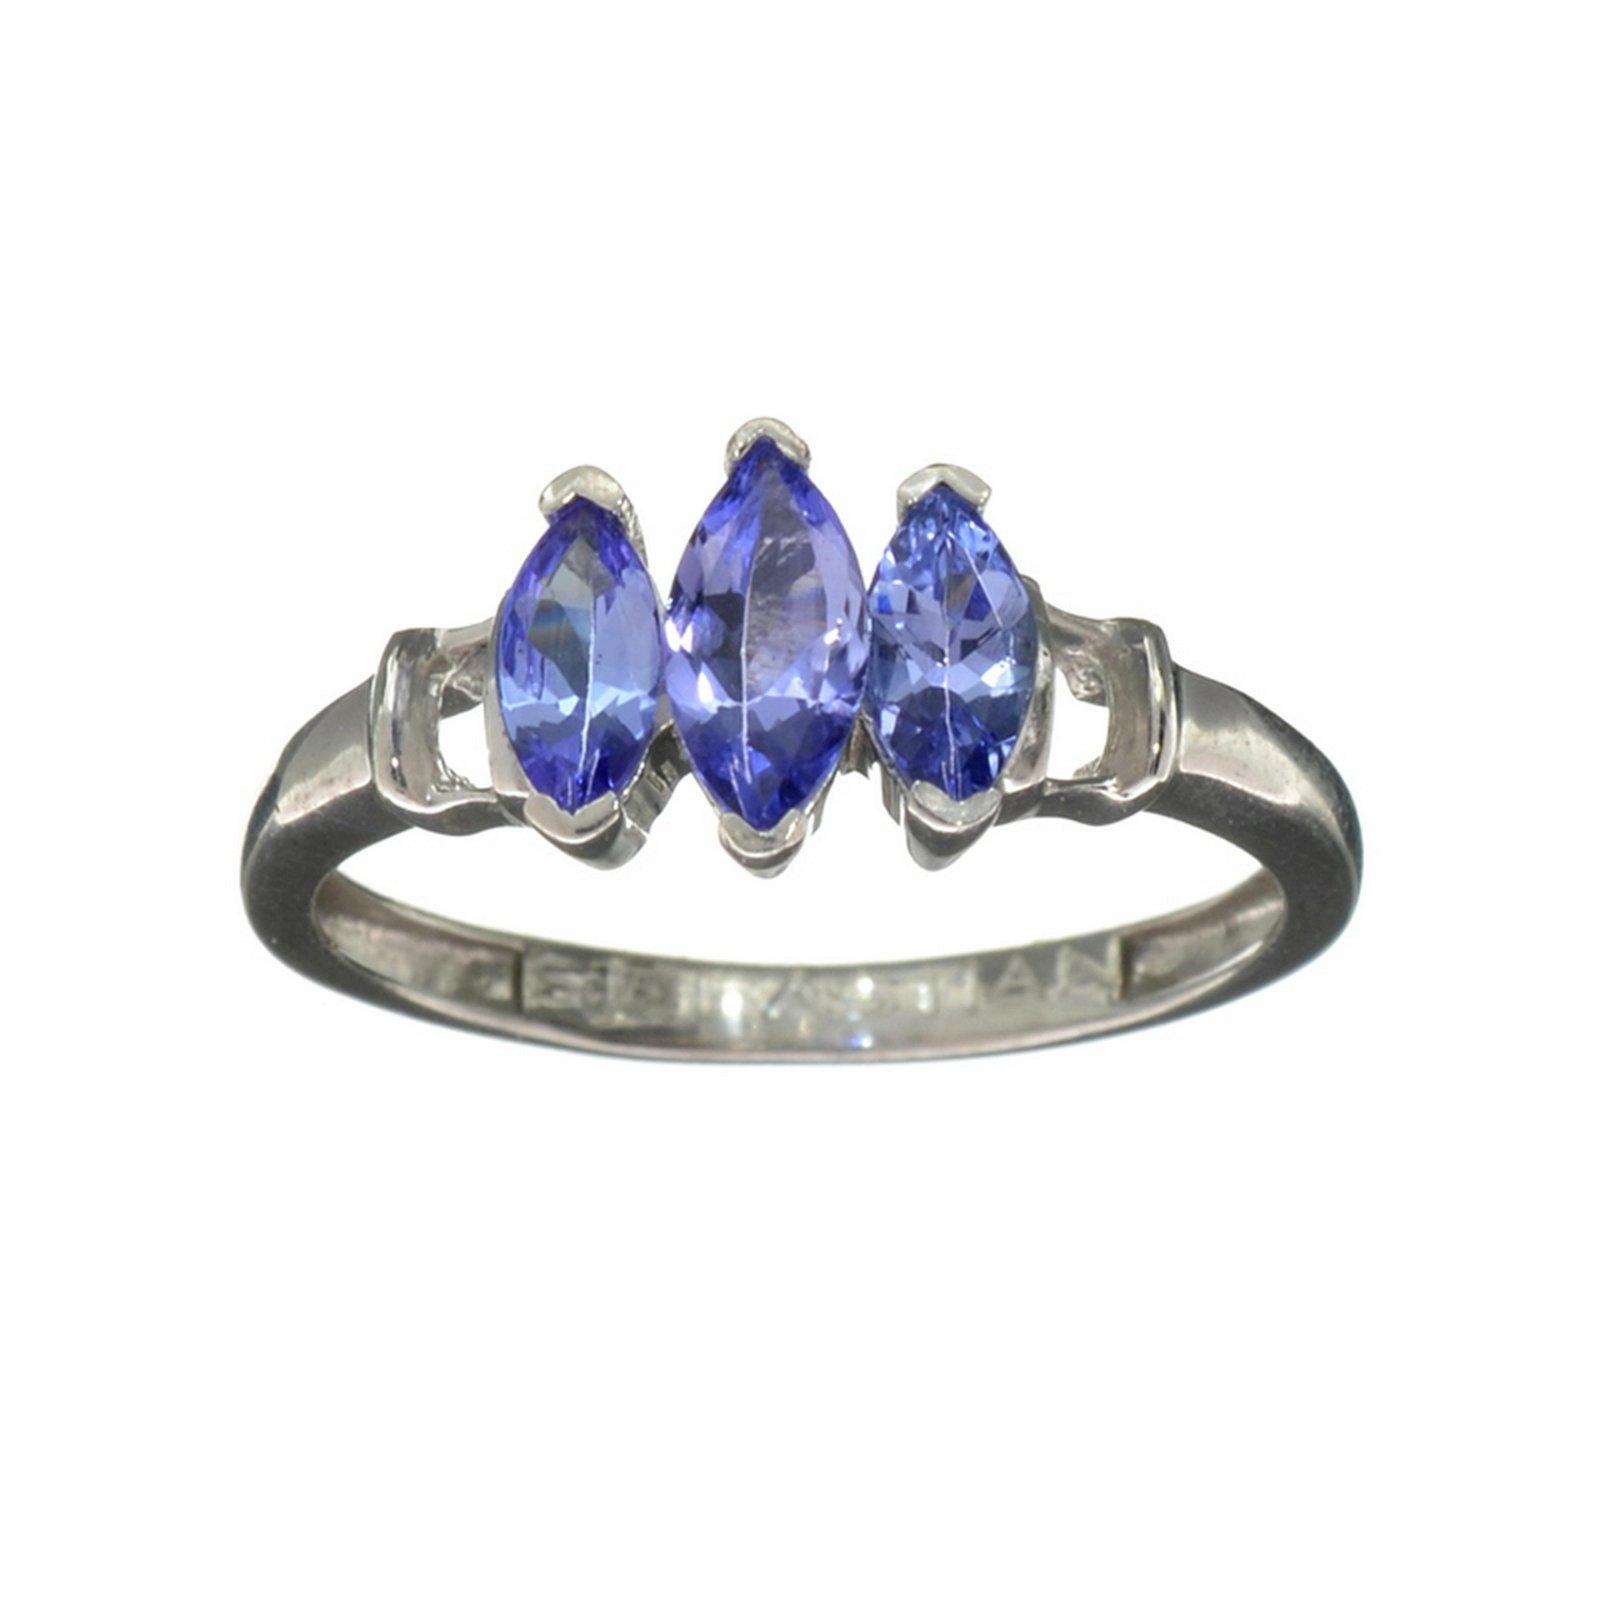 Fine Jewelry 1.10CT Marquise Cut Violet Blue Tanzanite